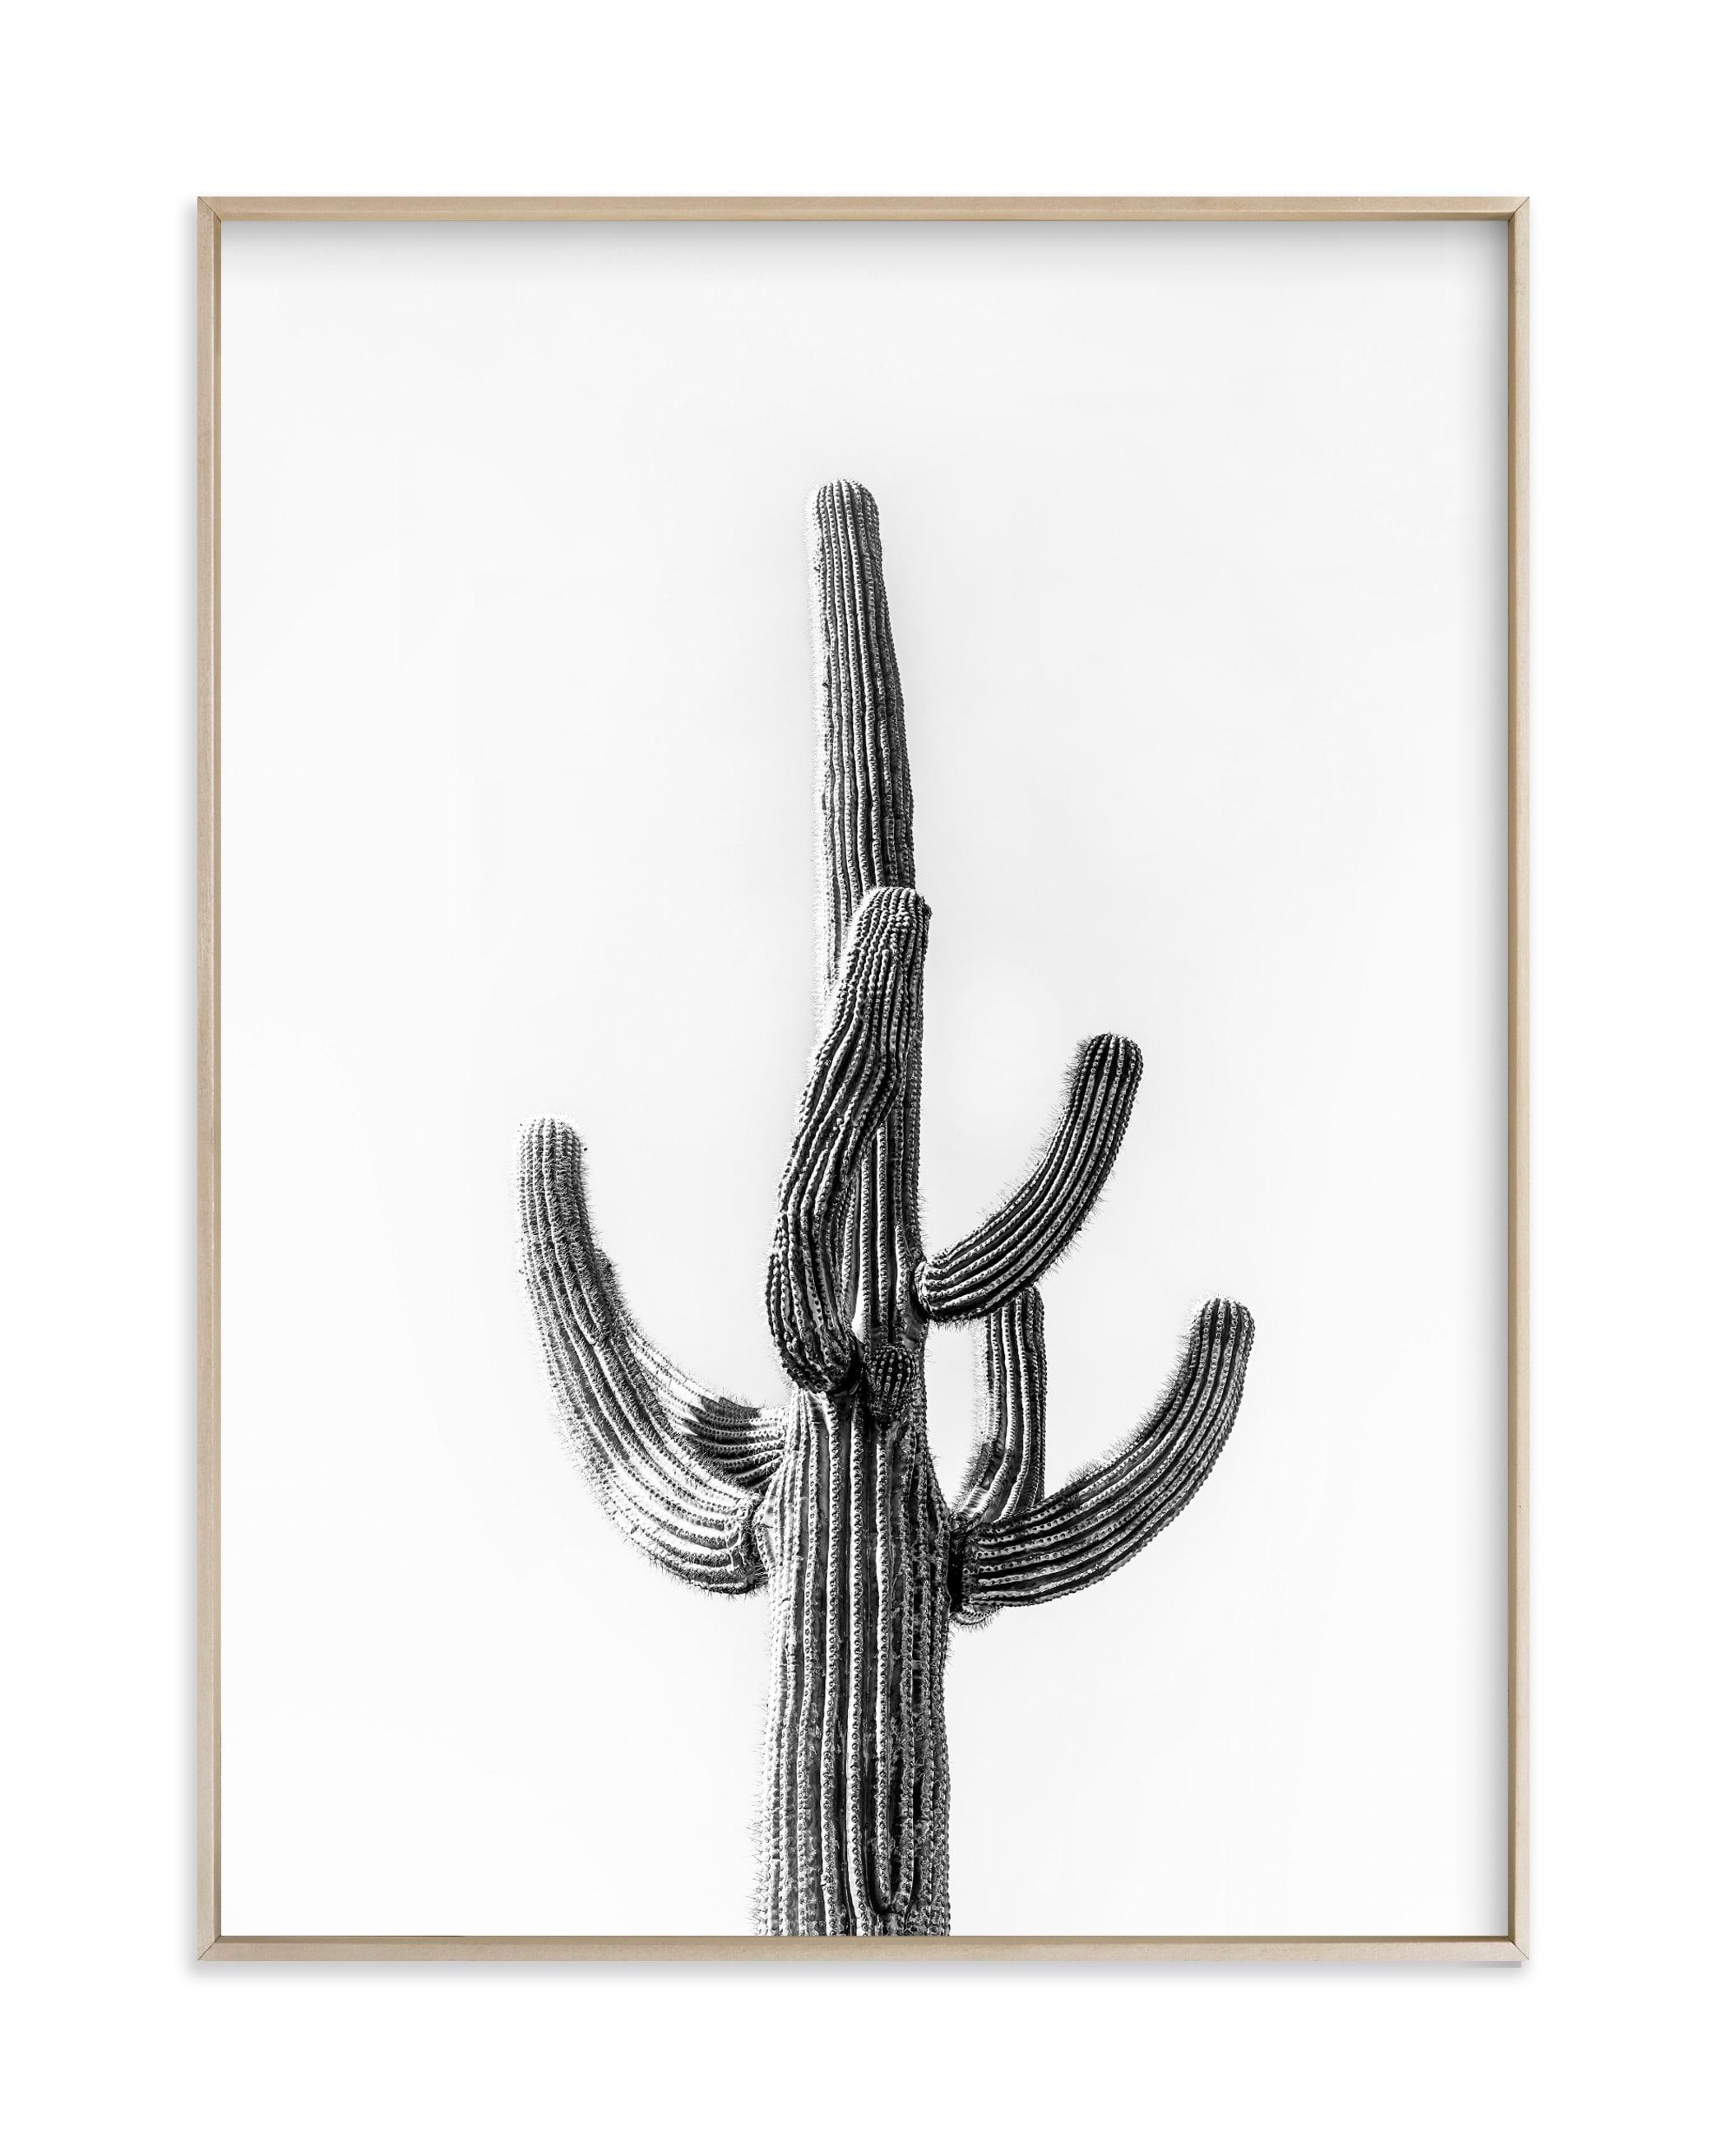 Lone Cactus Wall Art Print